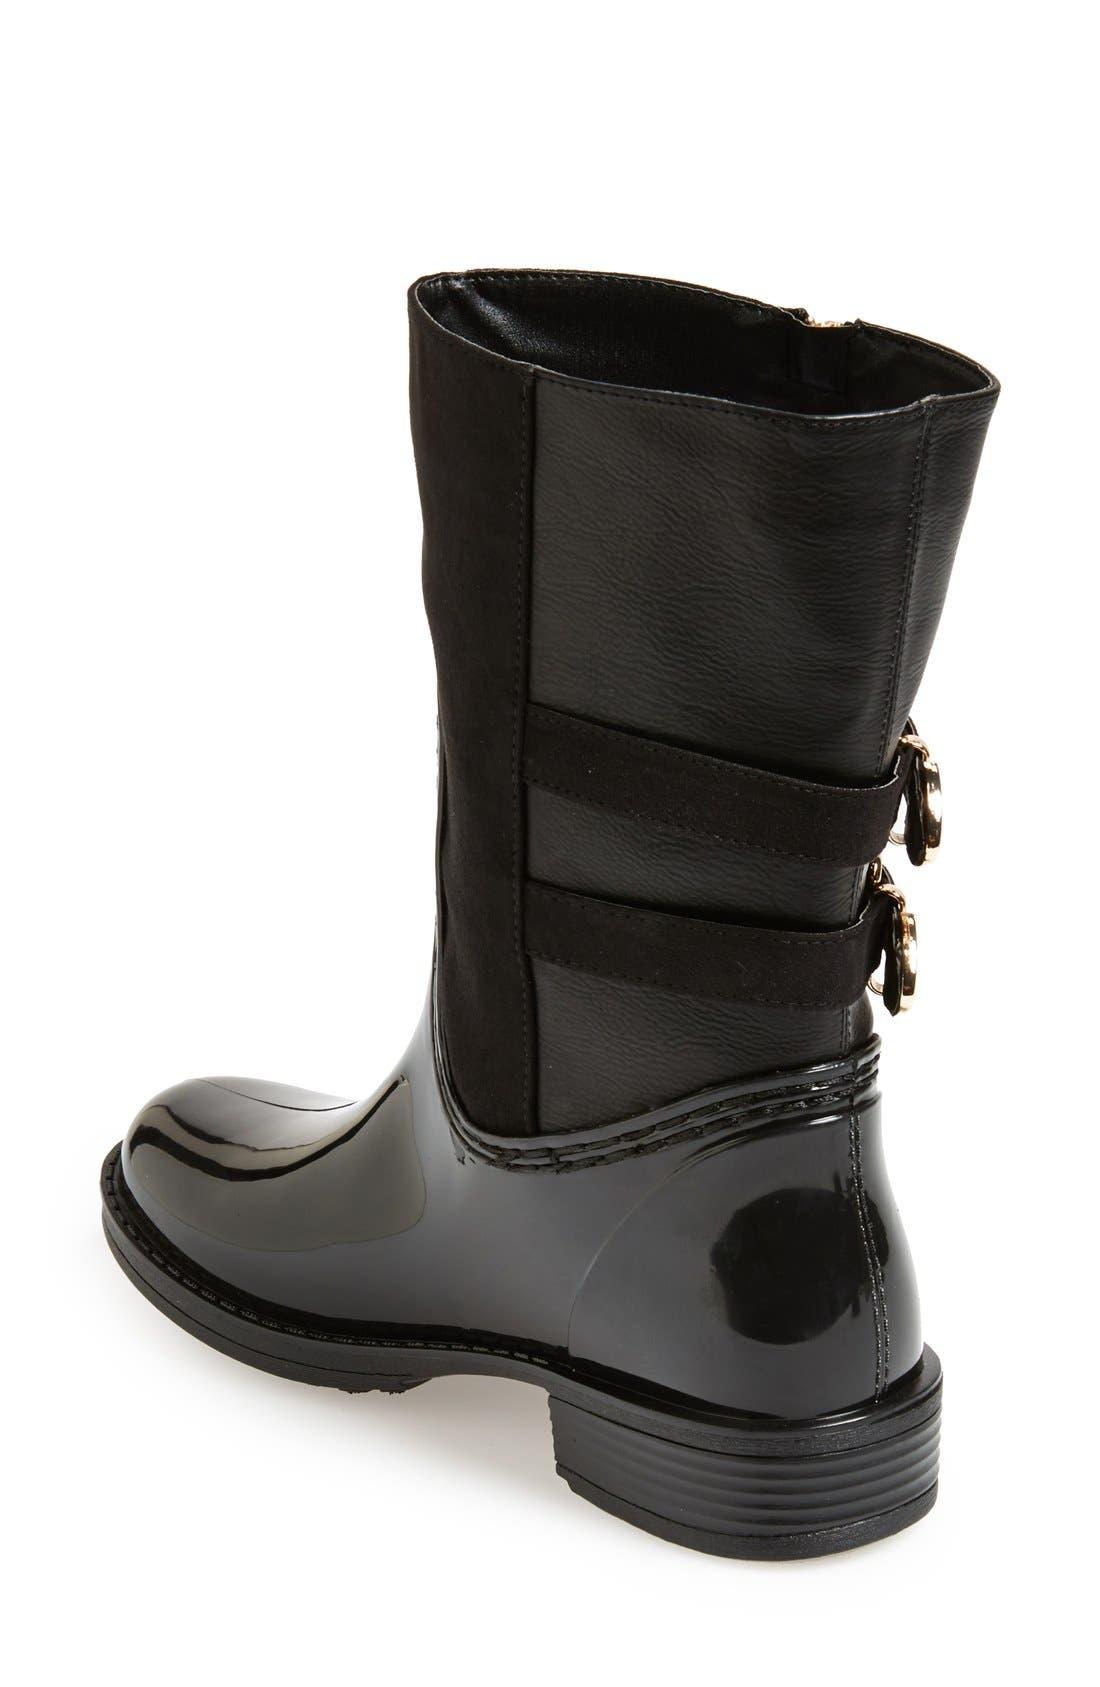 Alternate Image 2  - Posh Wellies 'Resilience' Mid Rain Boot (Women)